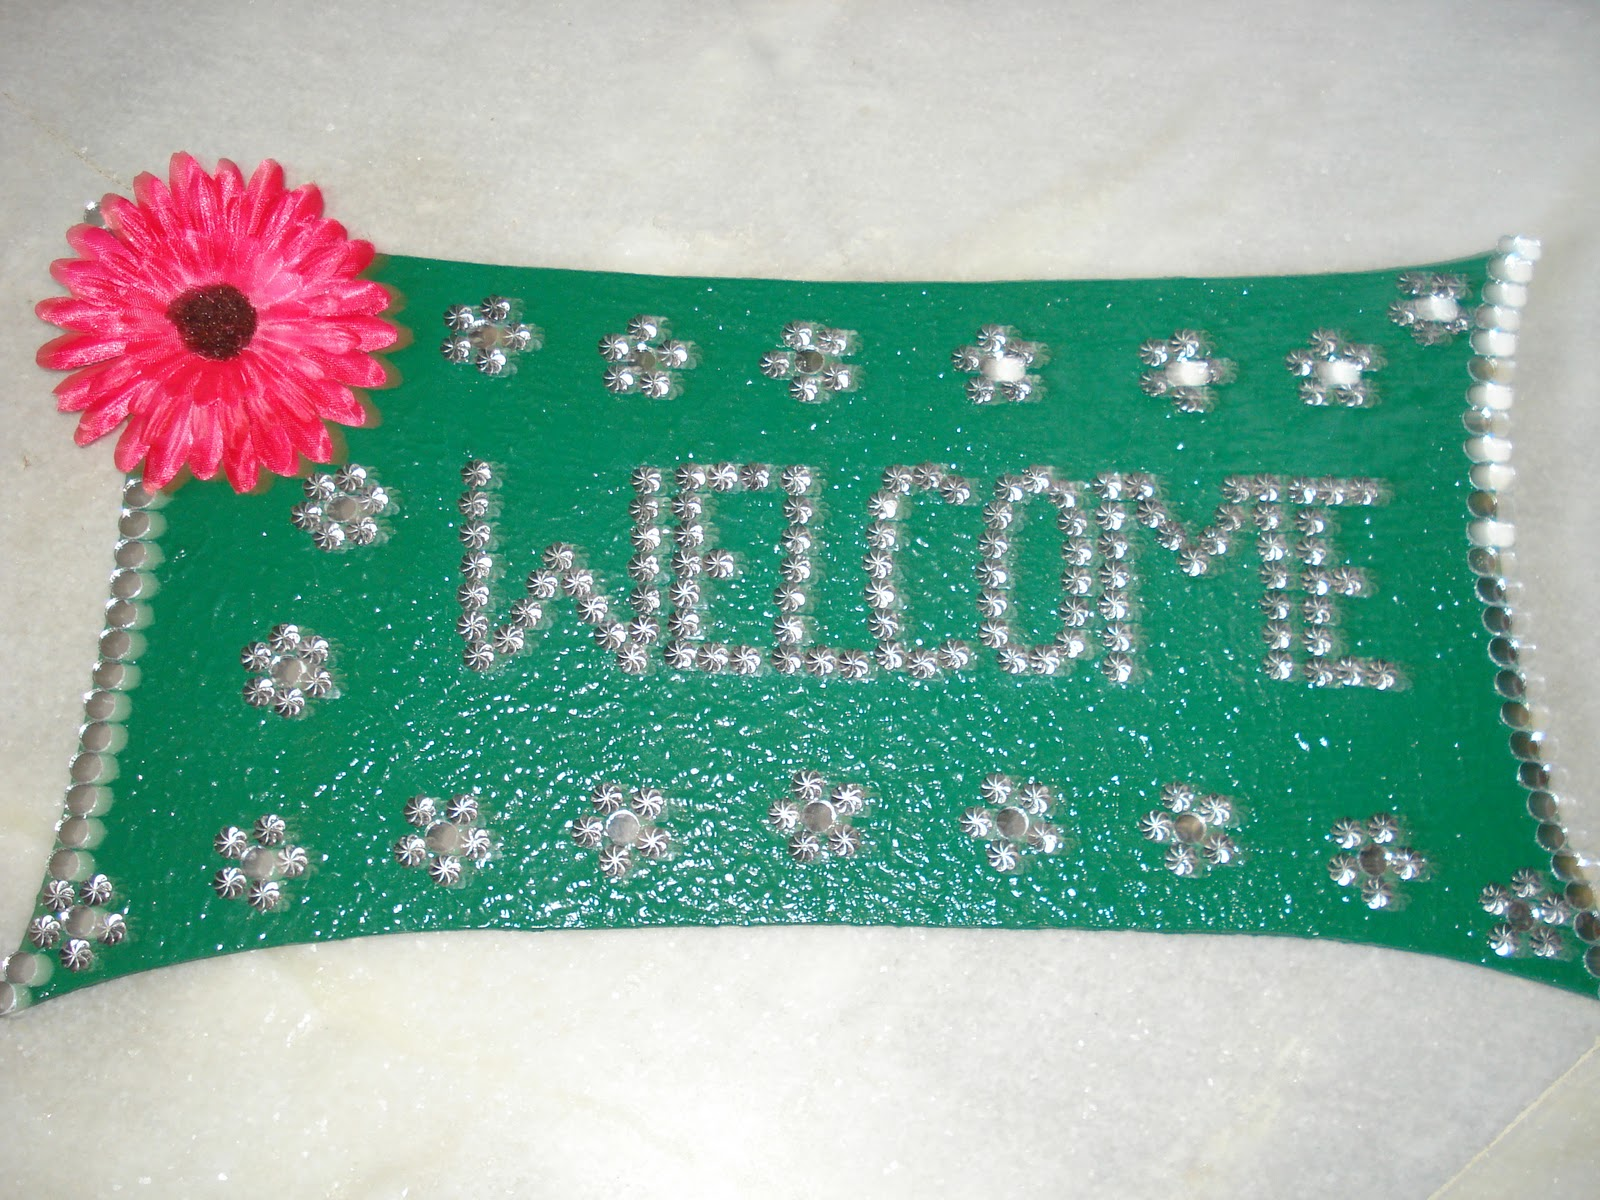 Indian Handmade Items Name Plate